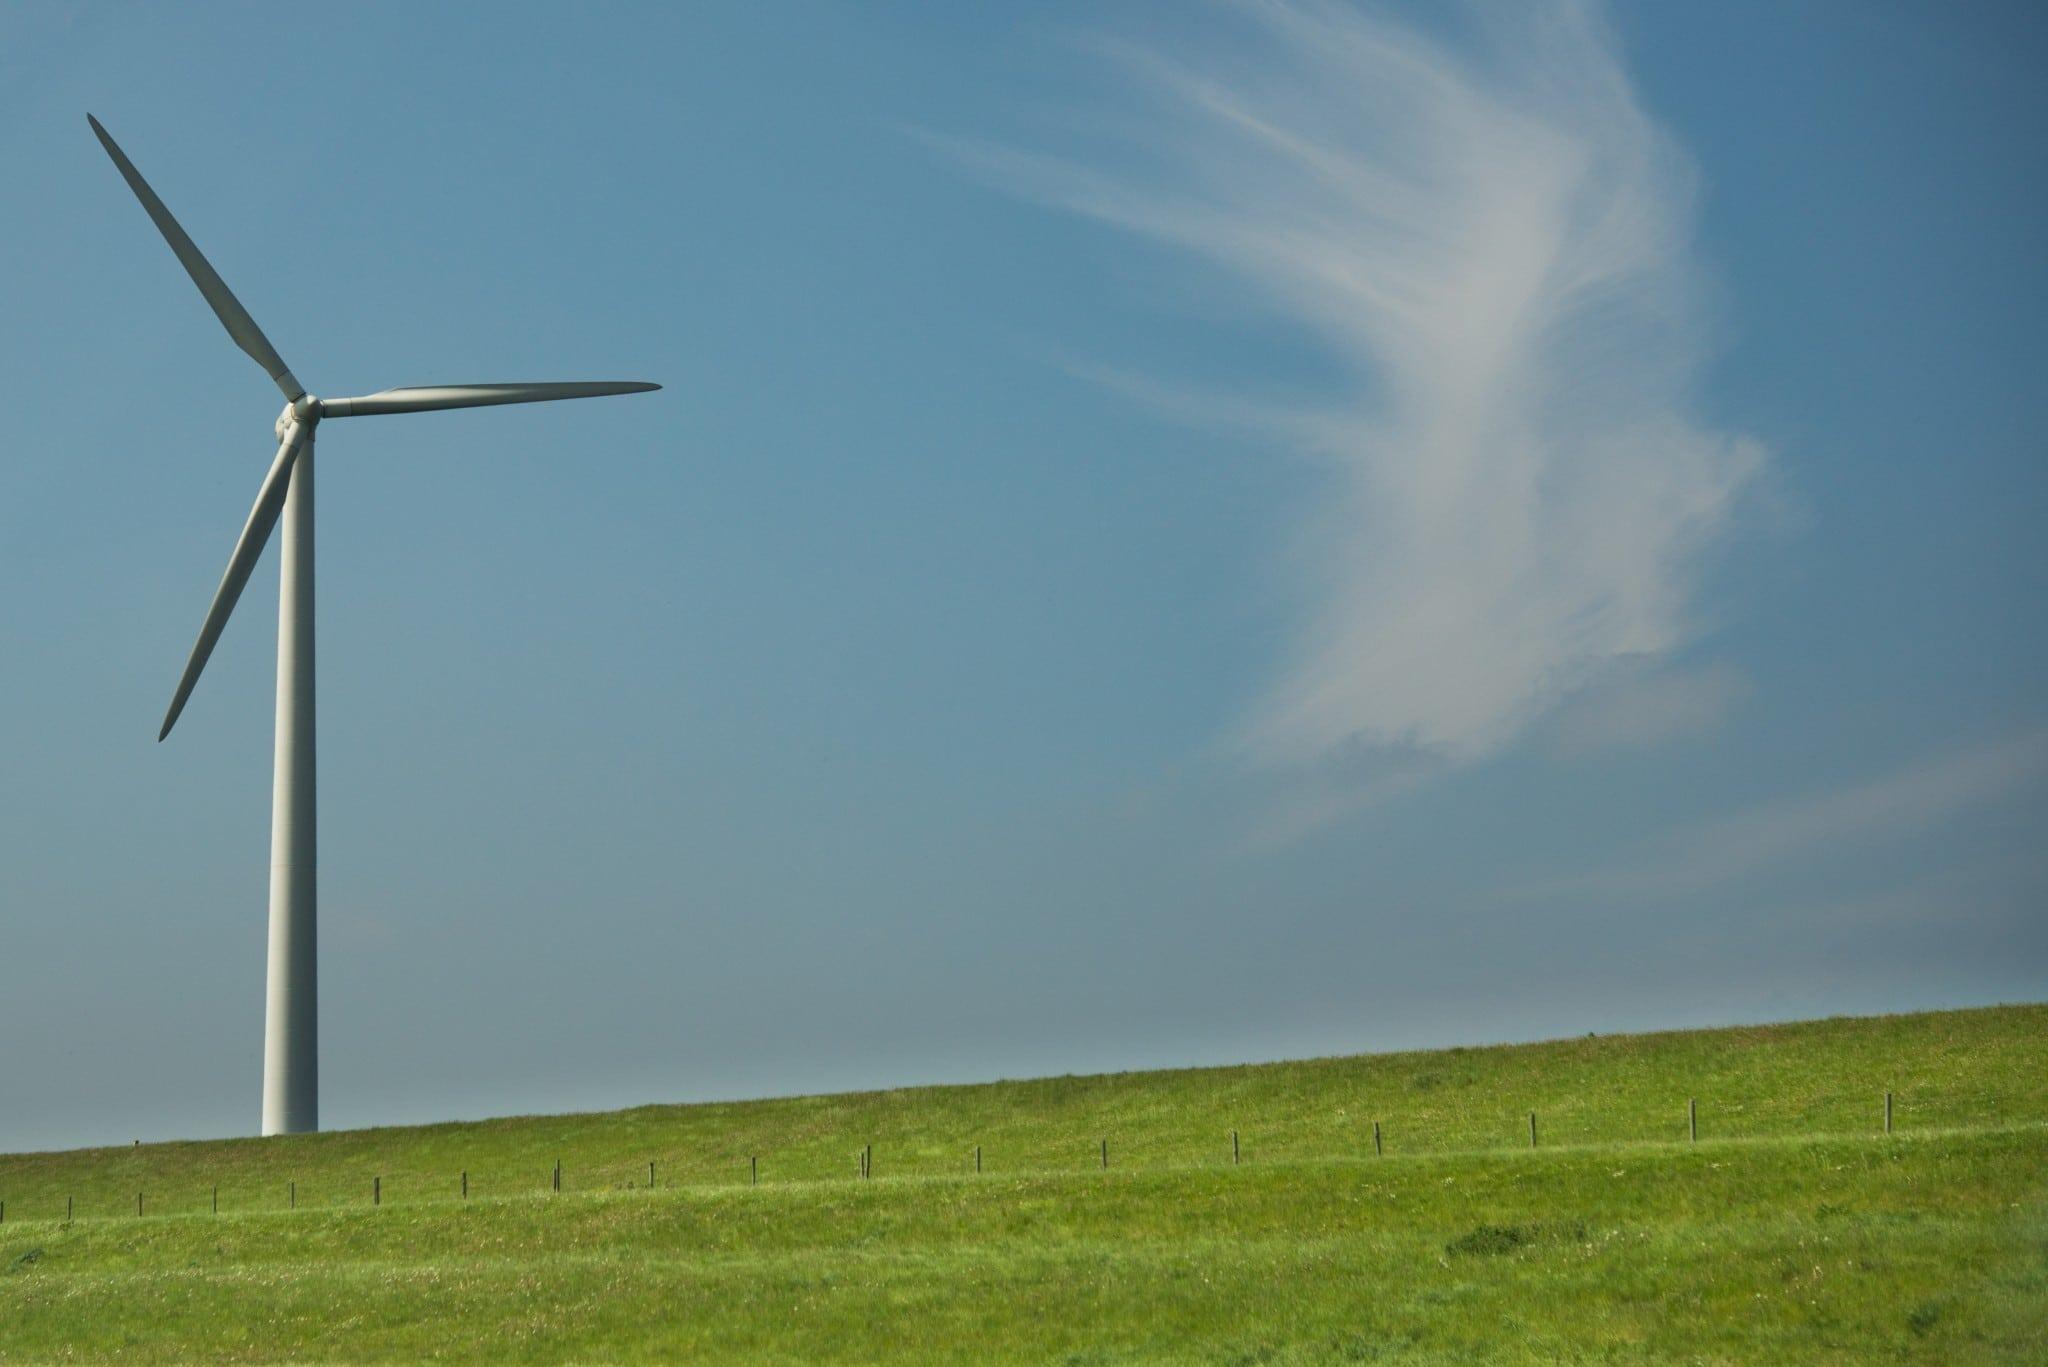 Canva White Wind Turbine 1 Moixa | Home Energy Storage | Smart Energy Management